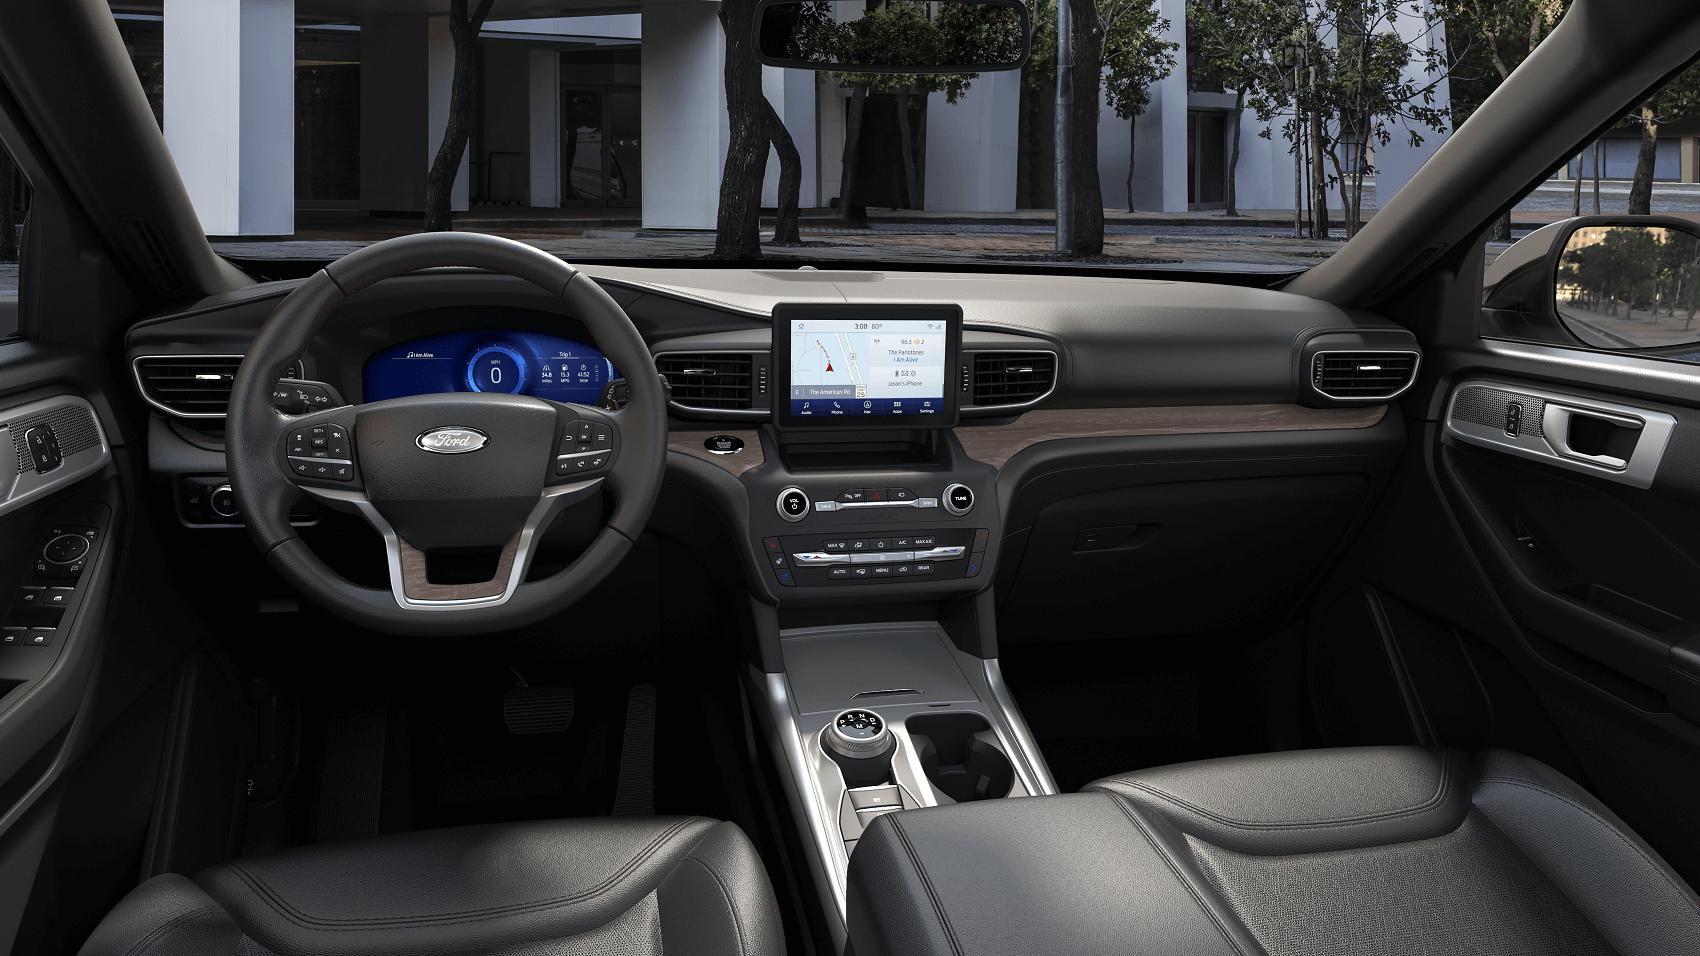 Ford Explorer Infotainment Technology